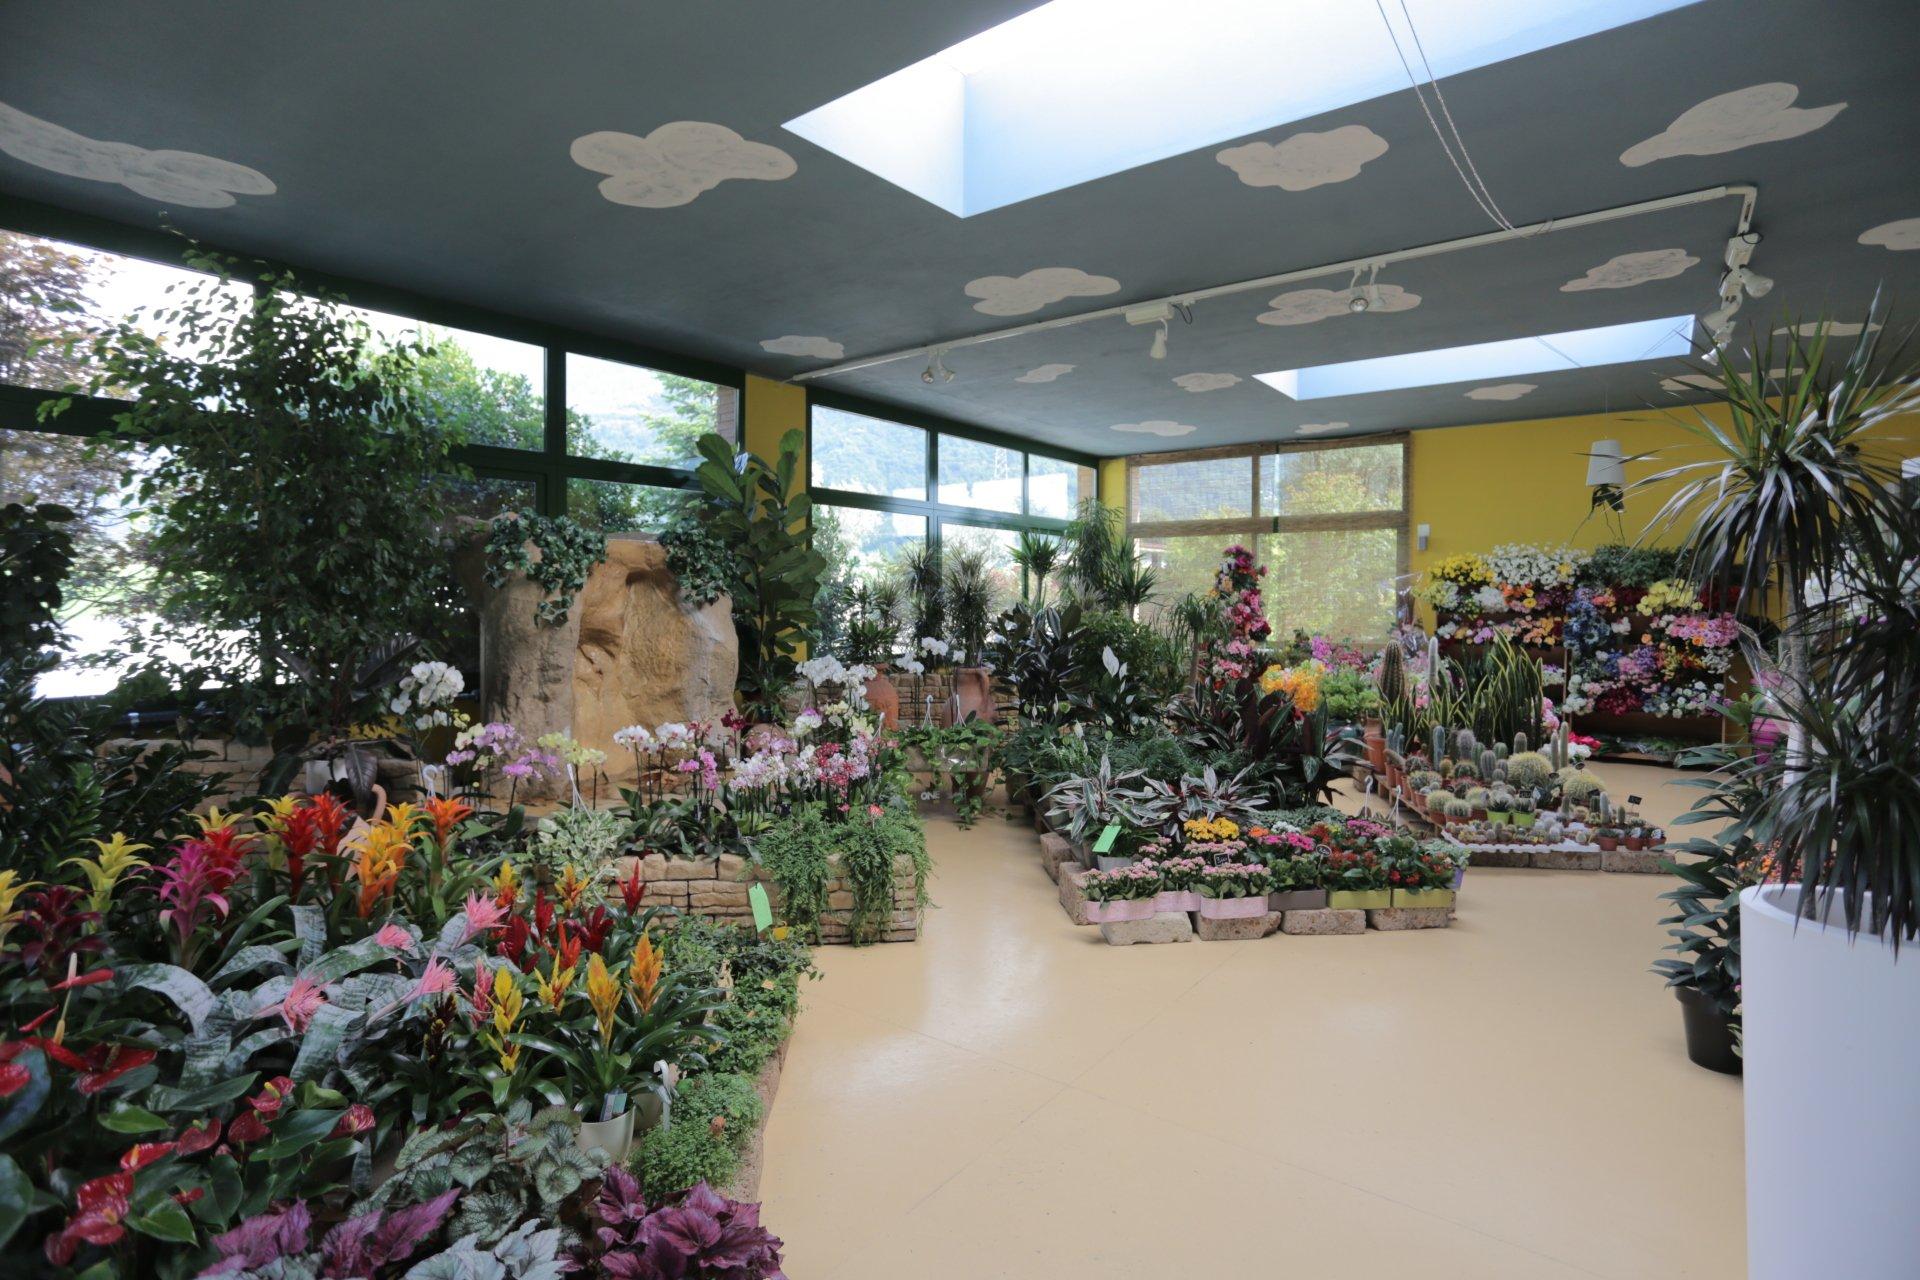 Articoli da giardinaggio  Brescia  Vivaio Bontempi